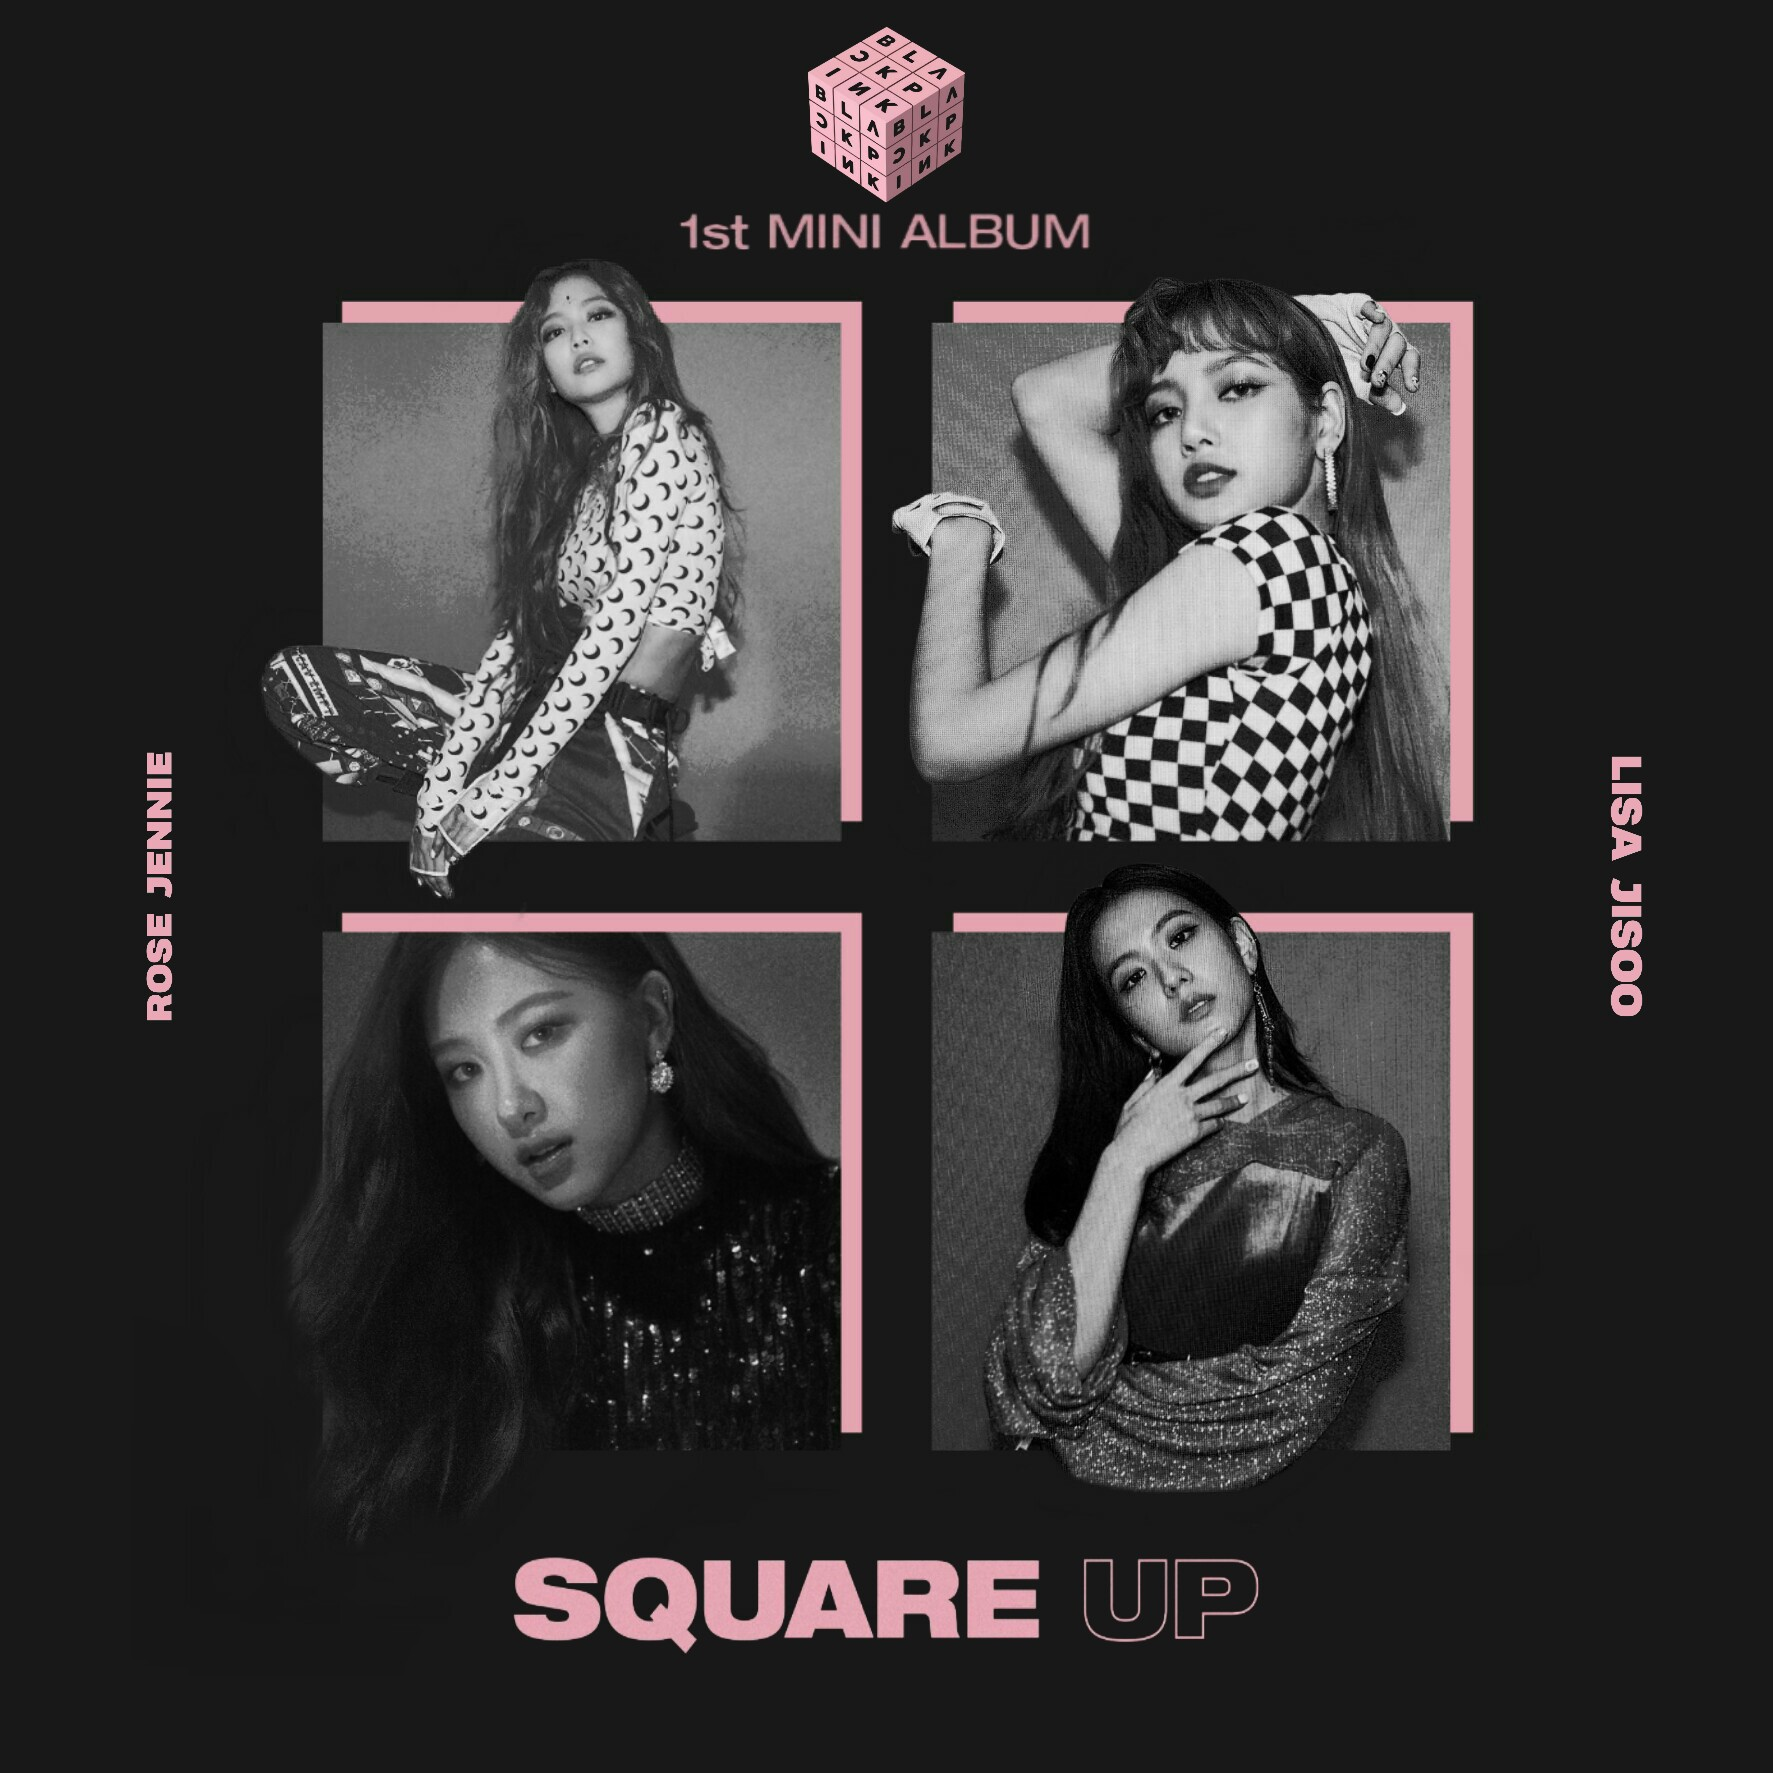 Blackpink Square Up Album Cover 1 By Lealbum On Deviantart